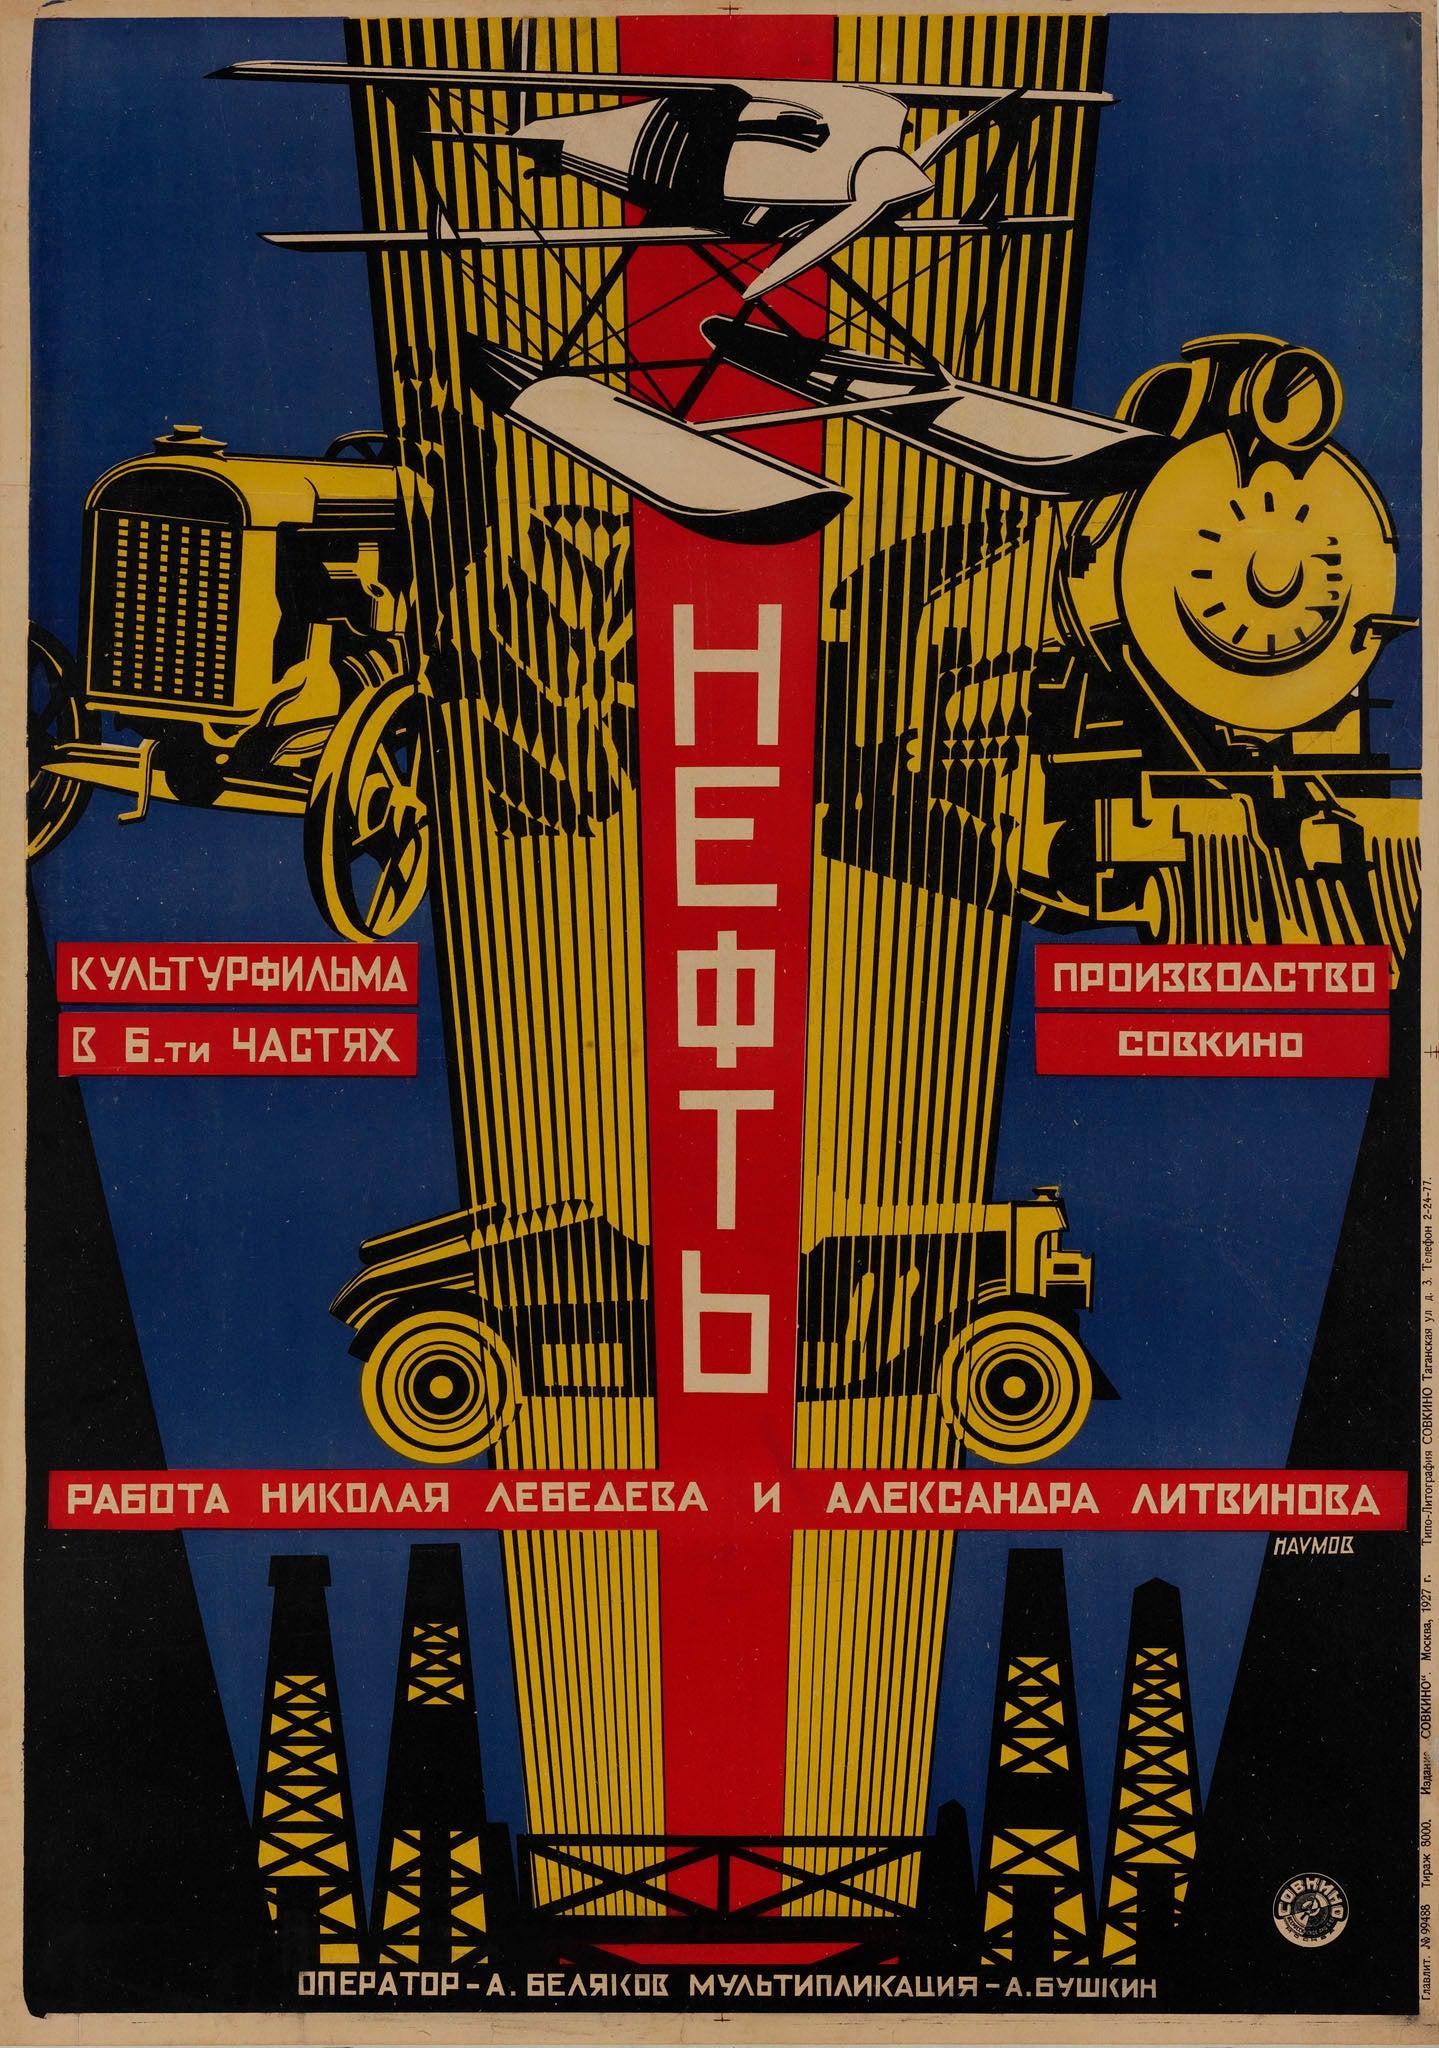 Poster design 1920s - Poster Design 1920s 21